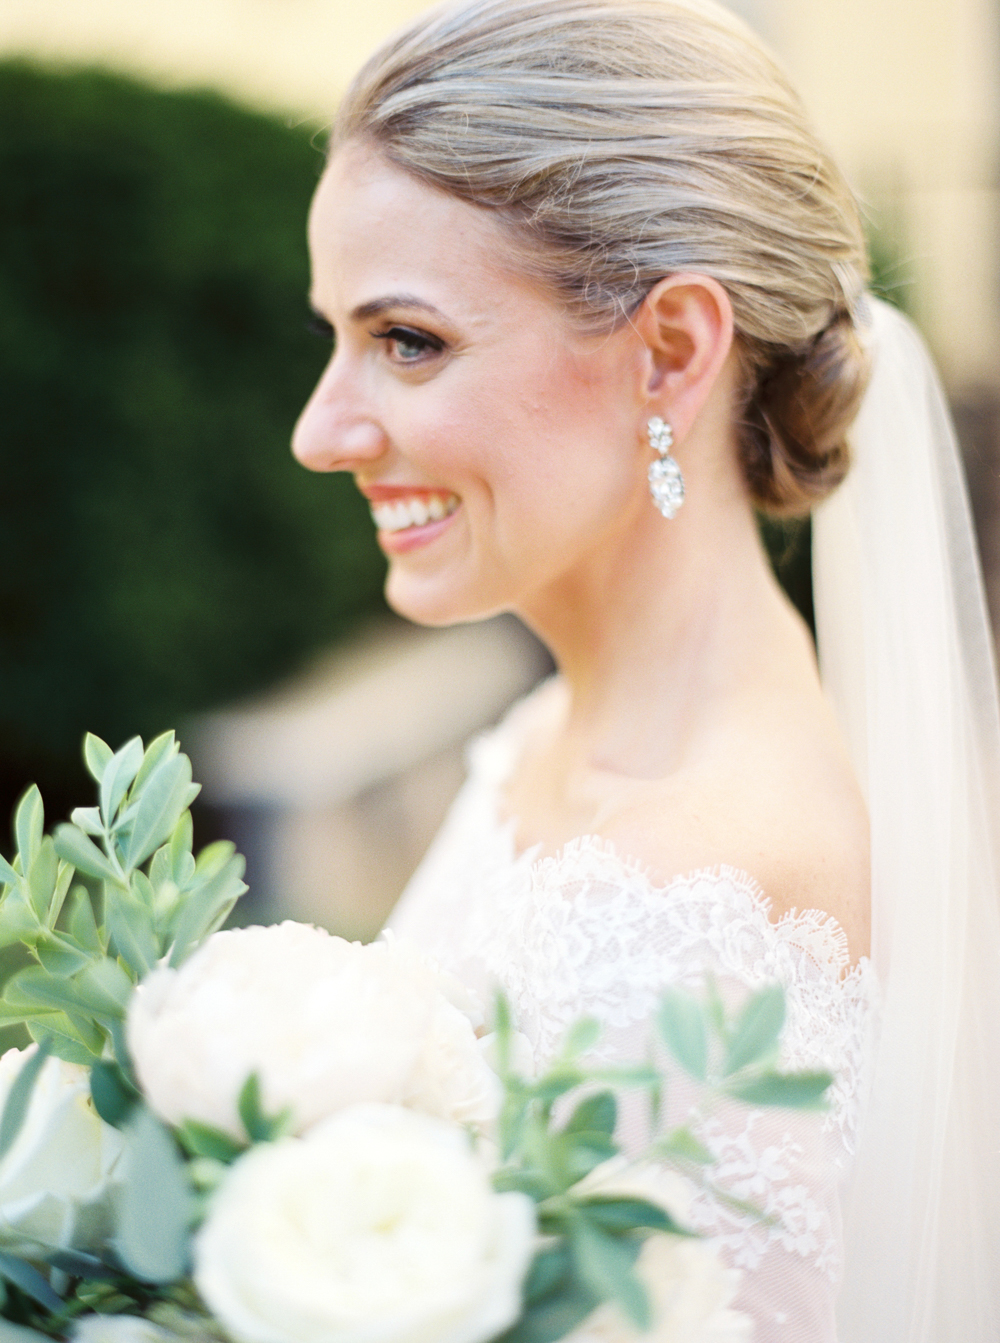 Kate-Ignatowski-Photography-Rachel-Tommy-Wedding-054.jpg